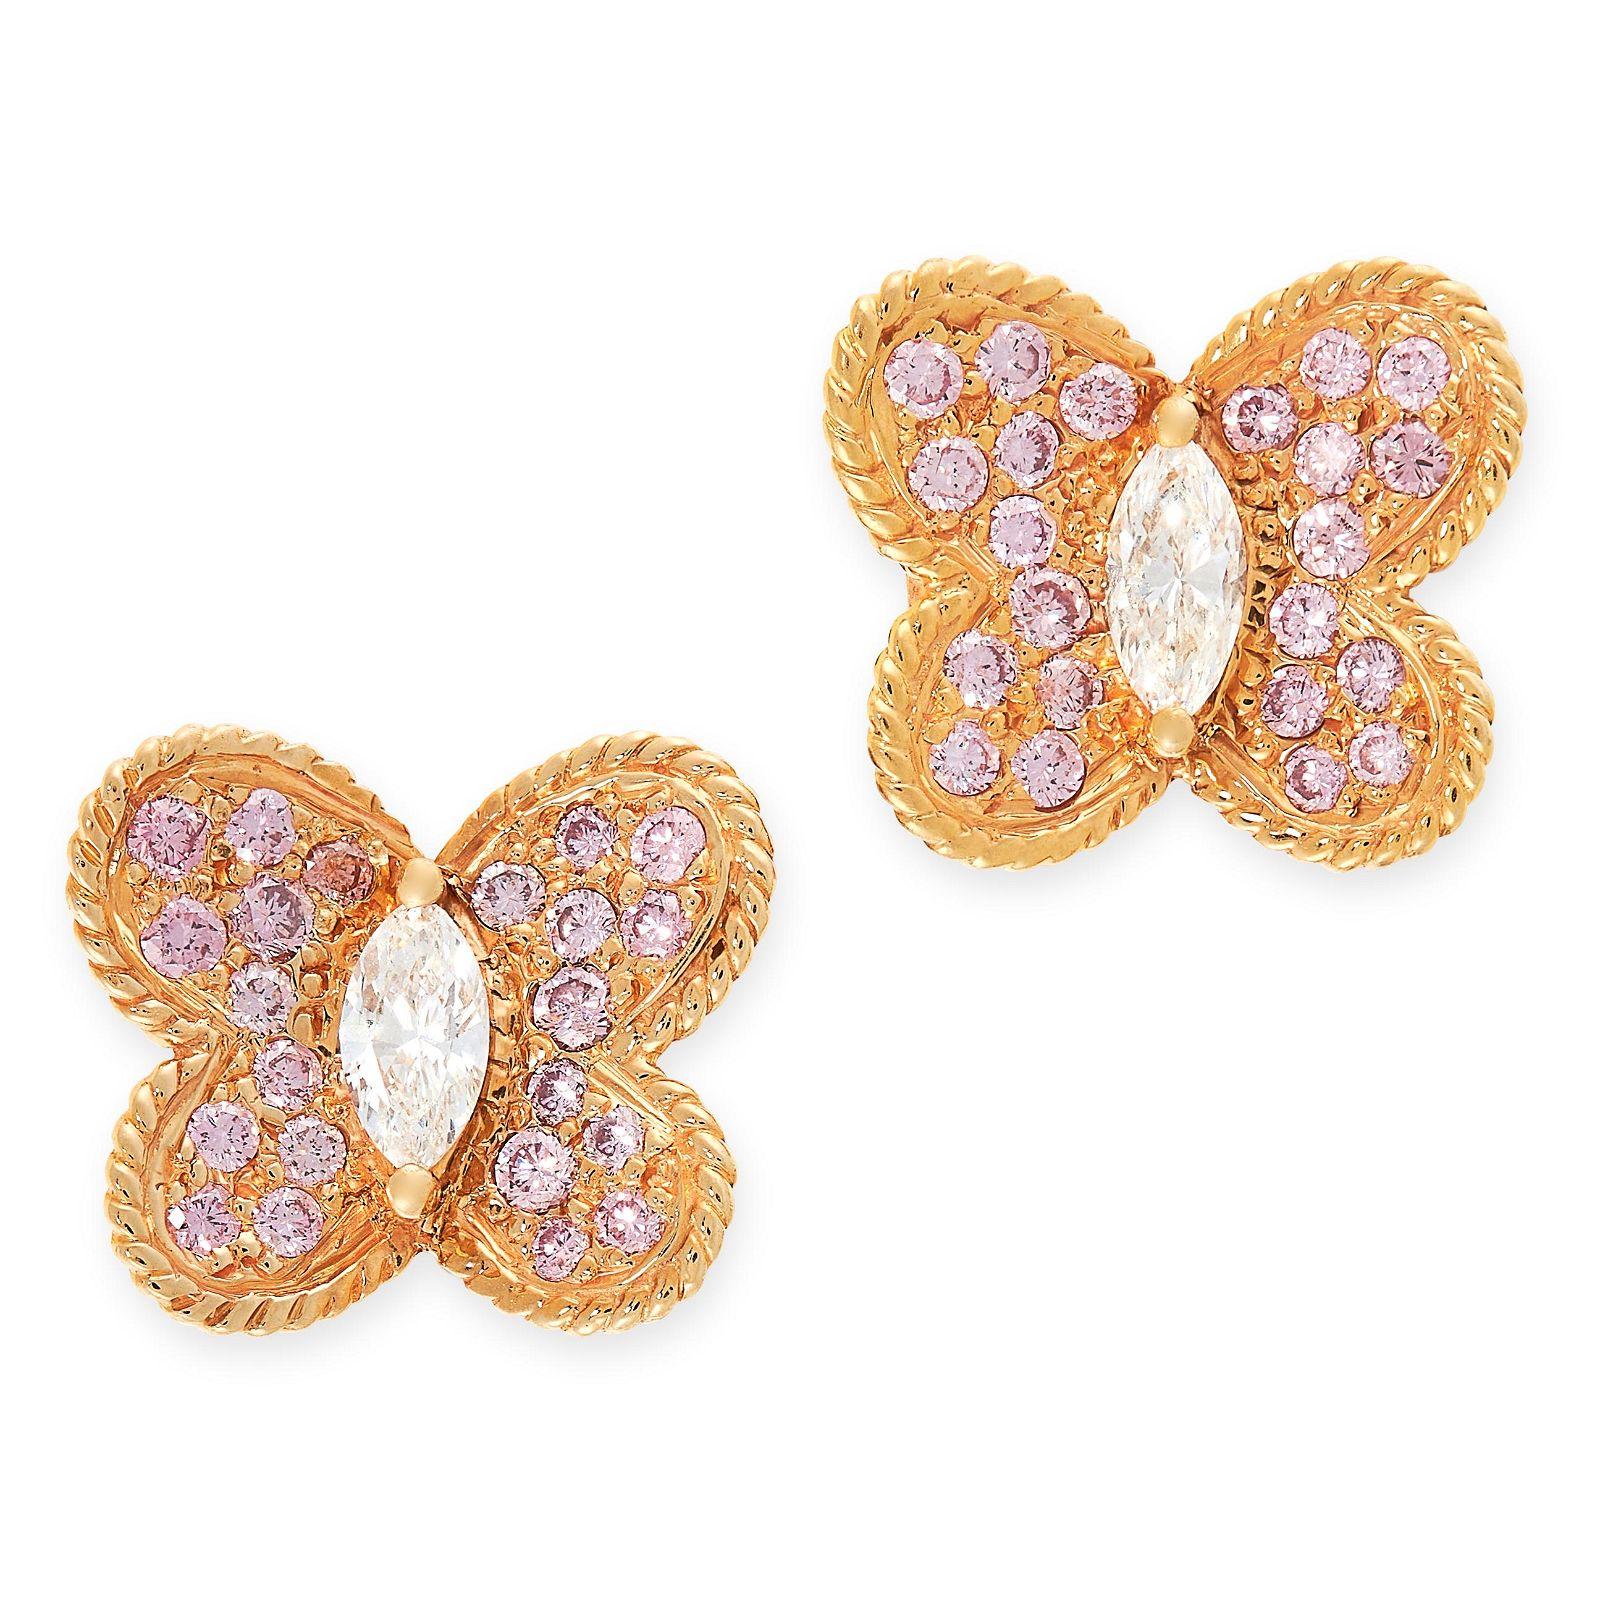 A PAIR OF PINK DIAMOND AND WHITE DIAMOND EARRINGS,